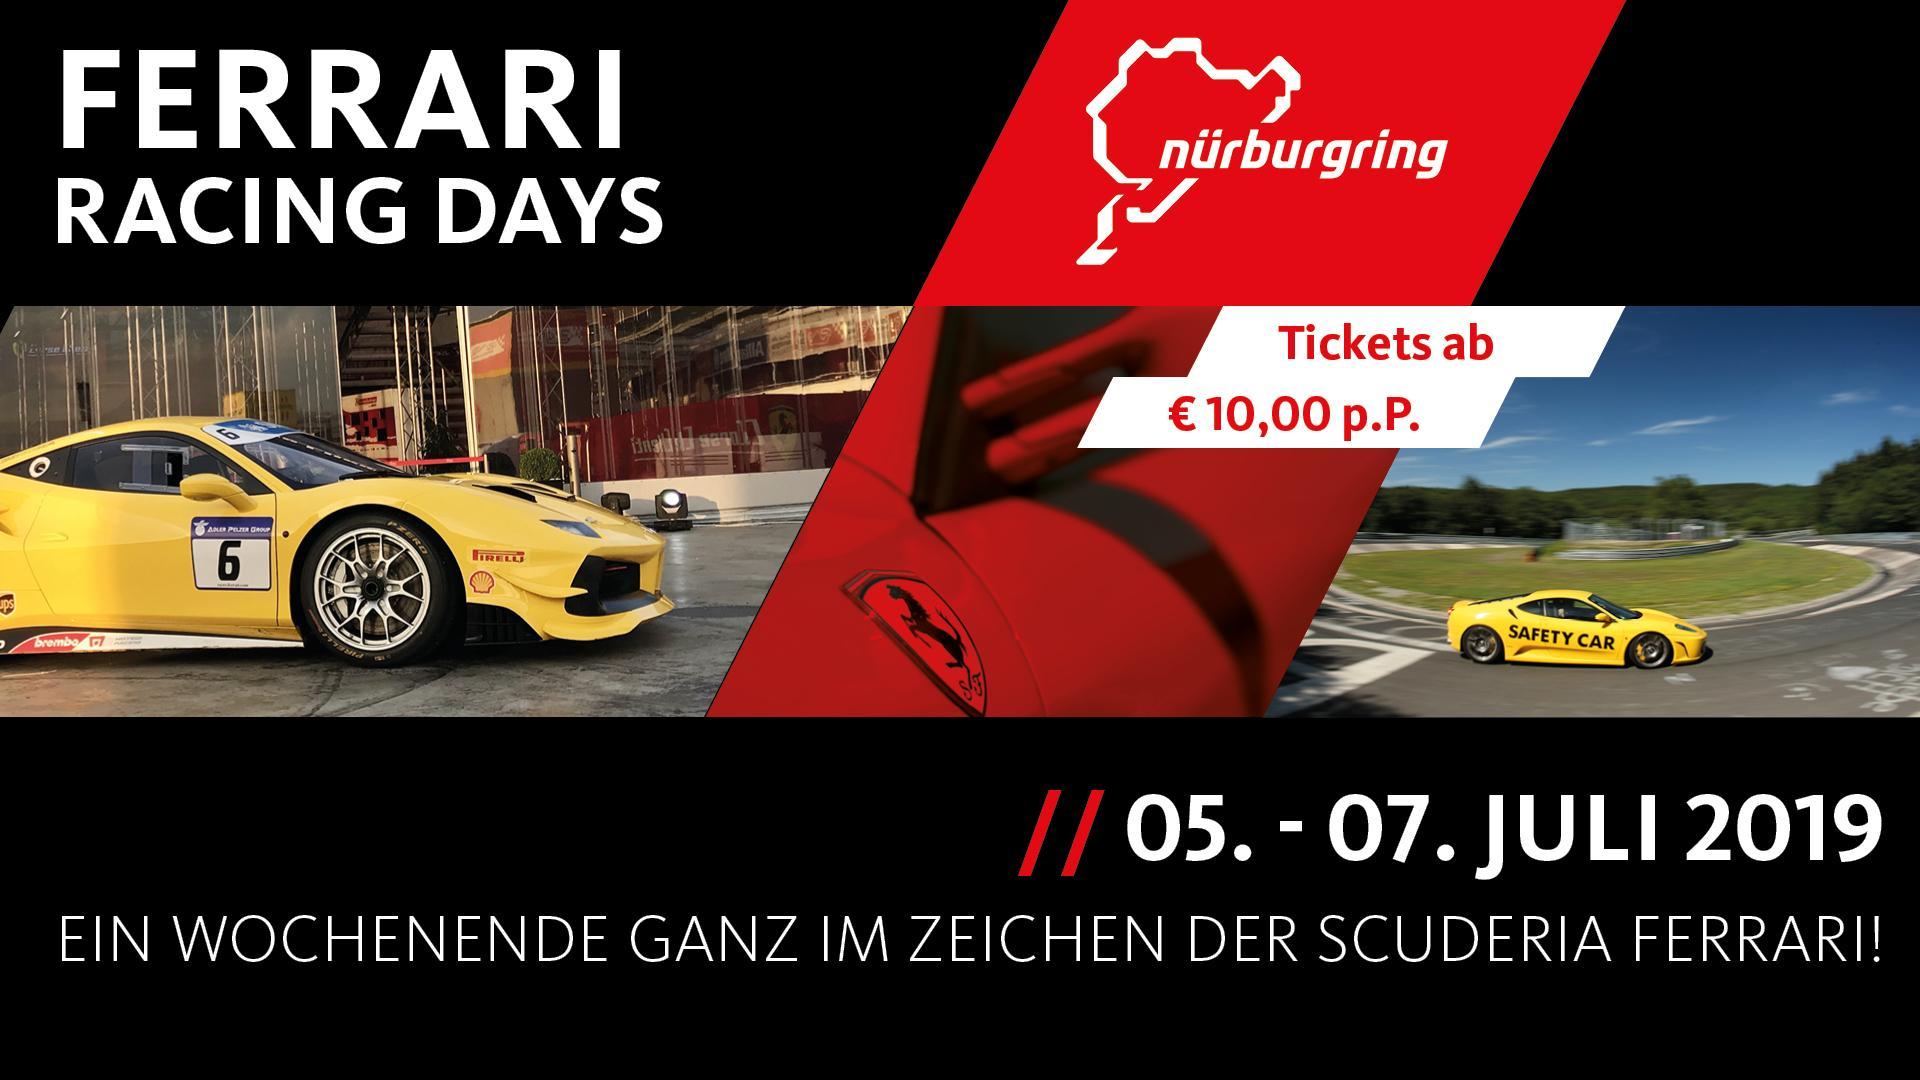 Plakat, @ Nürburgring 1927 GmbH & Co KG